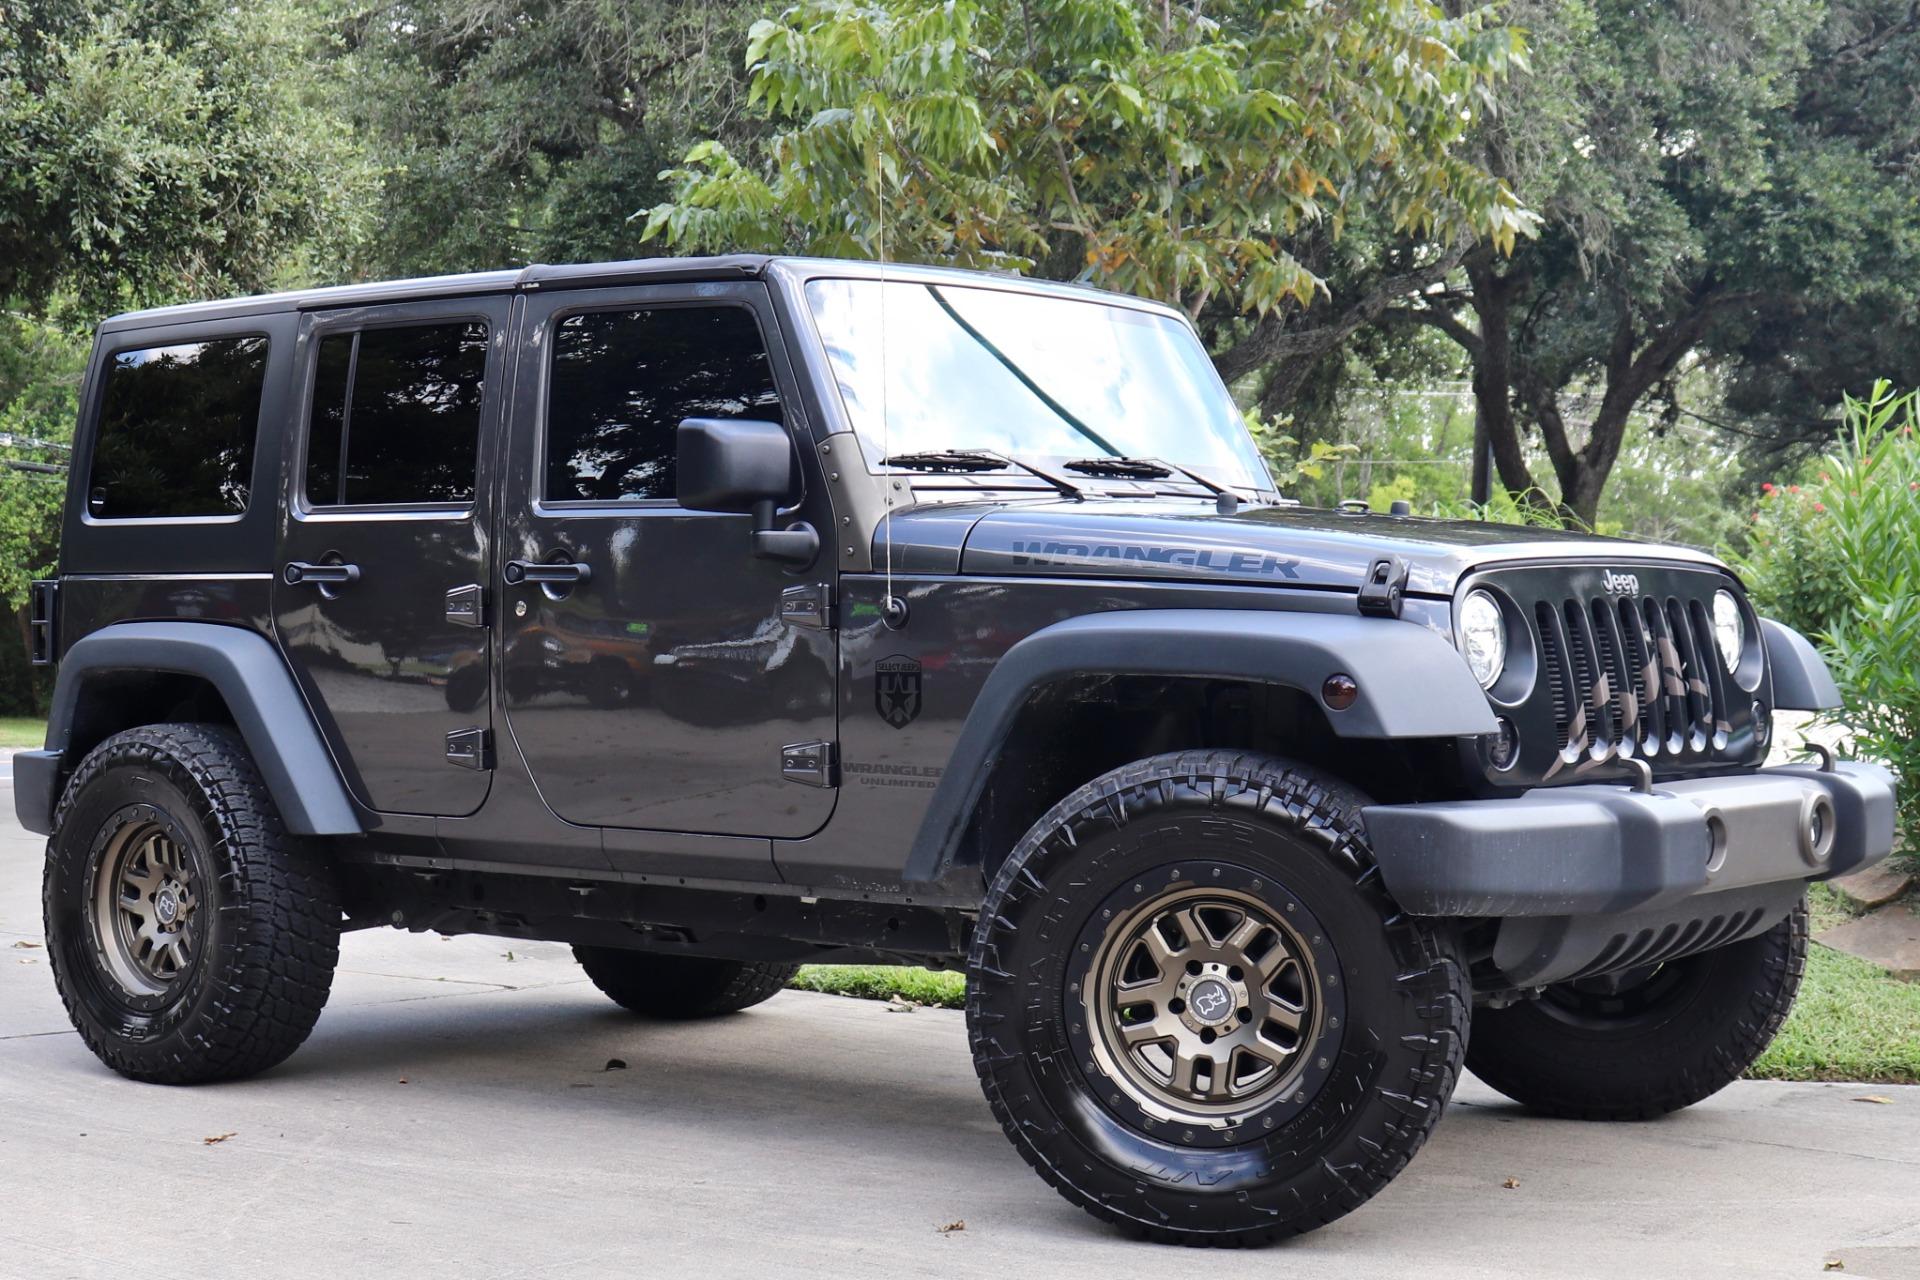 Used-2017-Jeep-Wrangler-Unlimited-Big-Bear